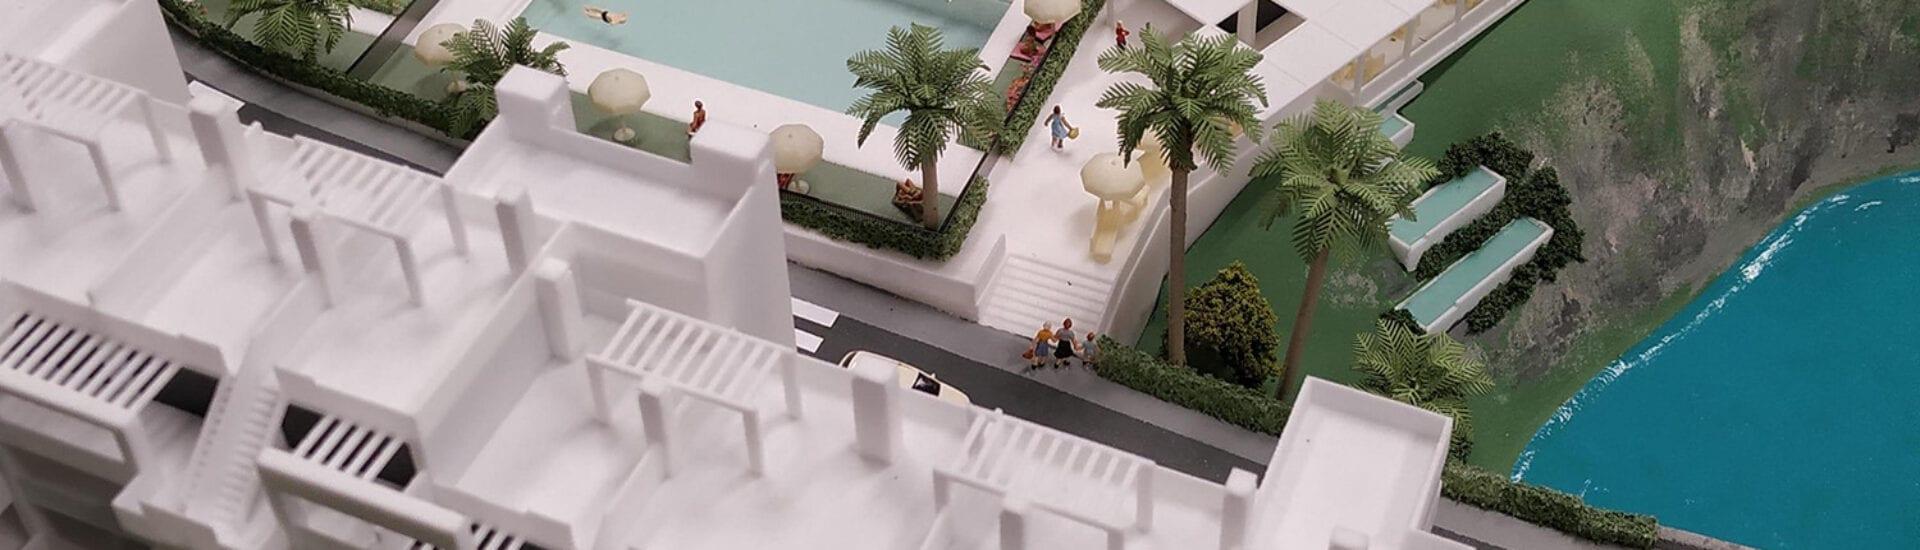 Maquette Spanje Oceanz 3D Printing